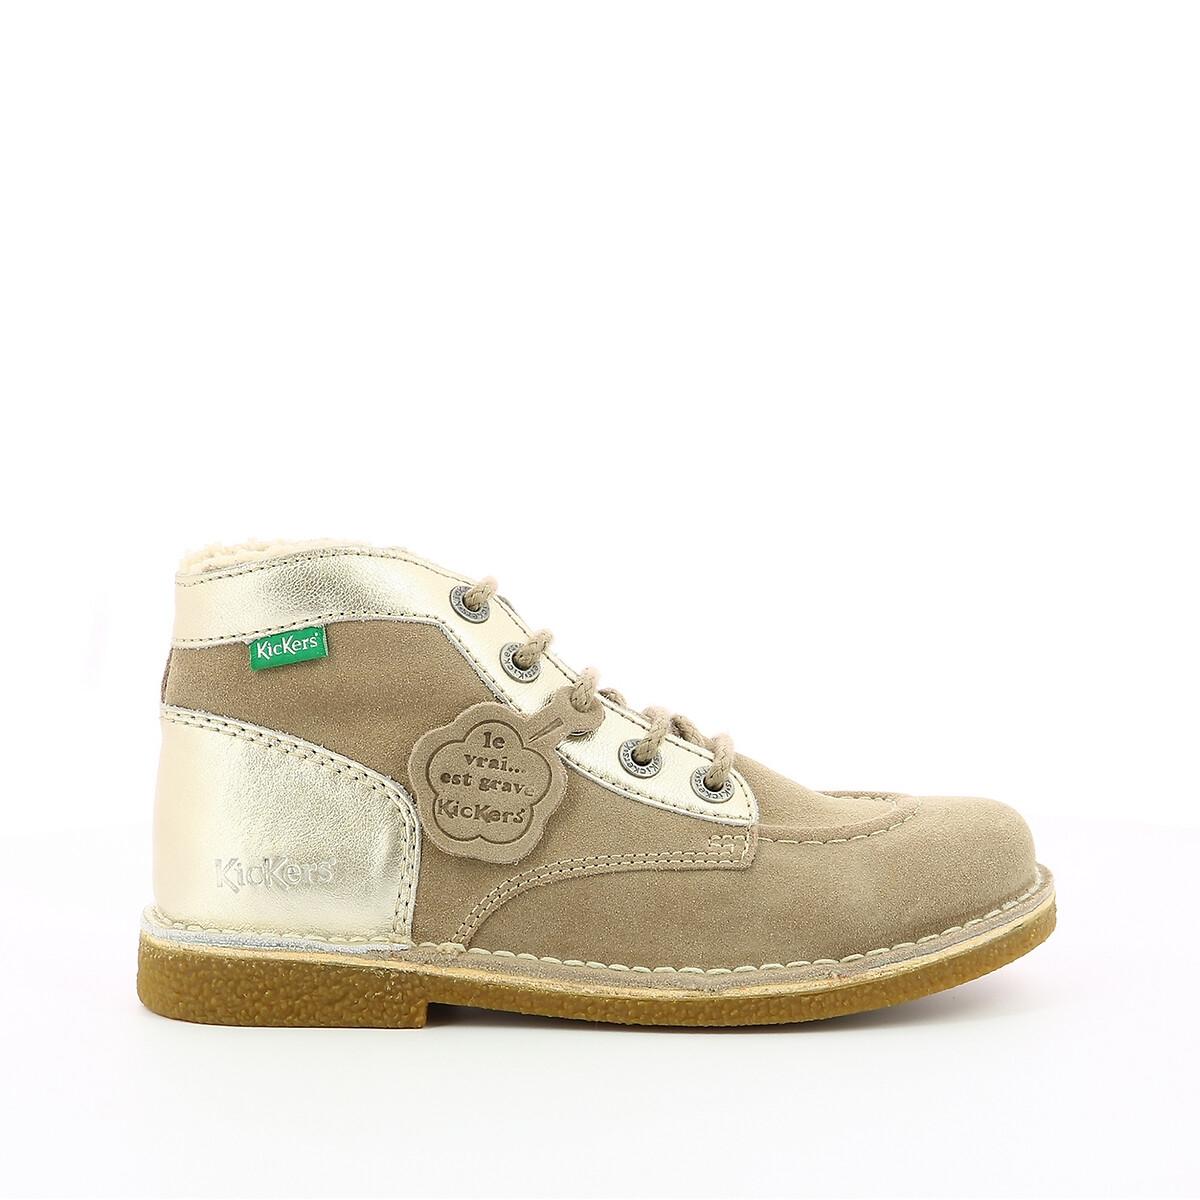 Legendiknew Leather Boots